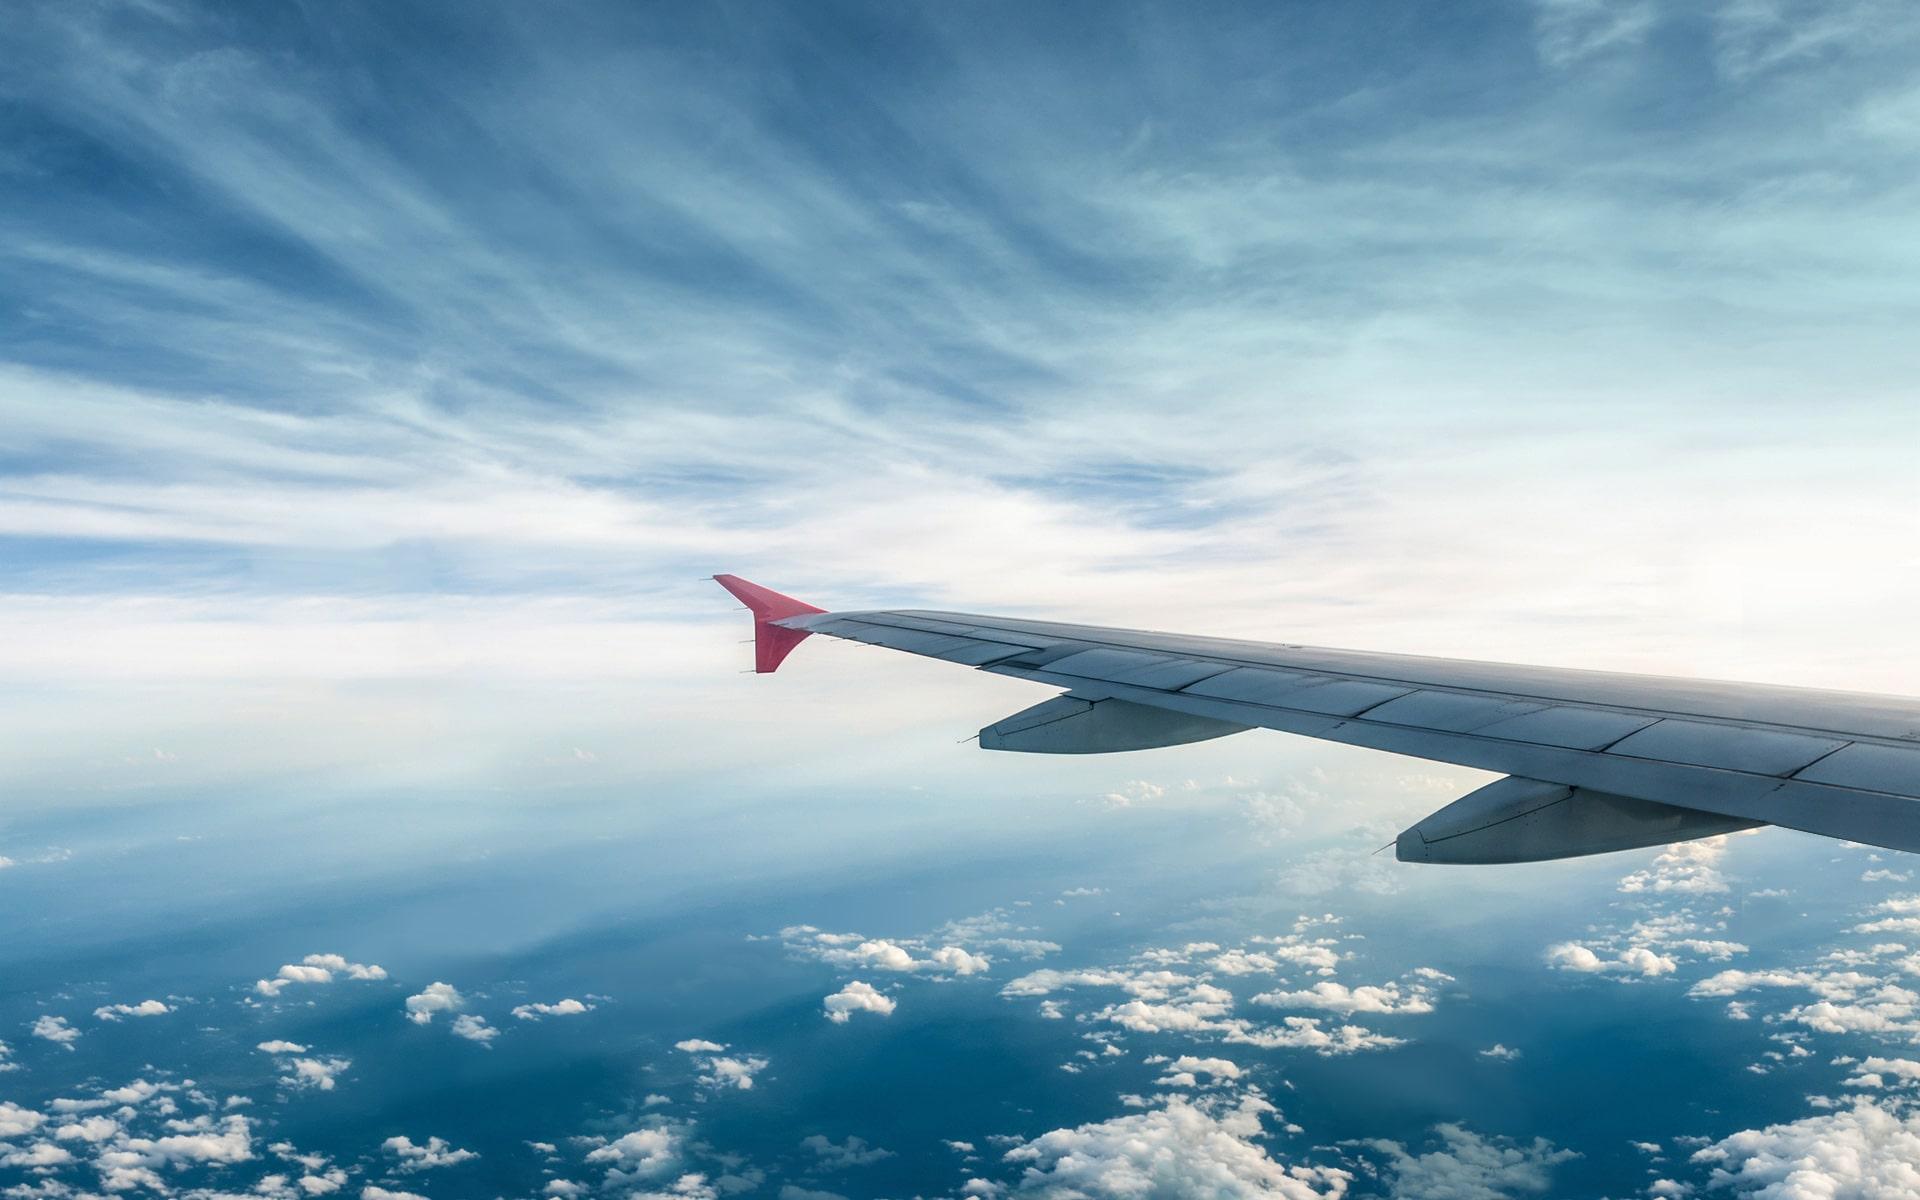 Vleugel van vliegtuig in mooie blauwe lucht